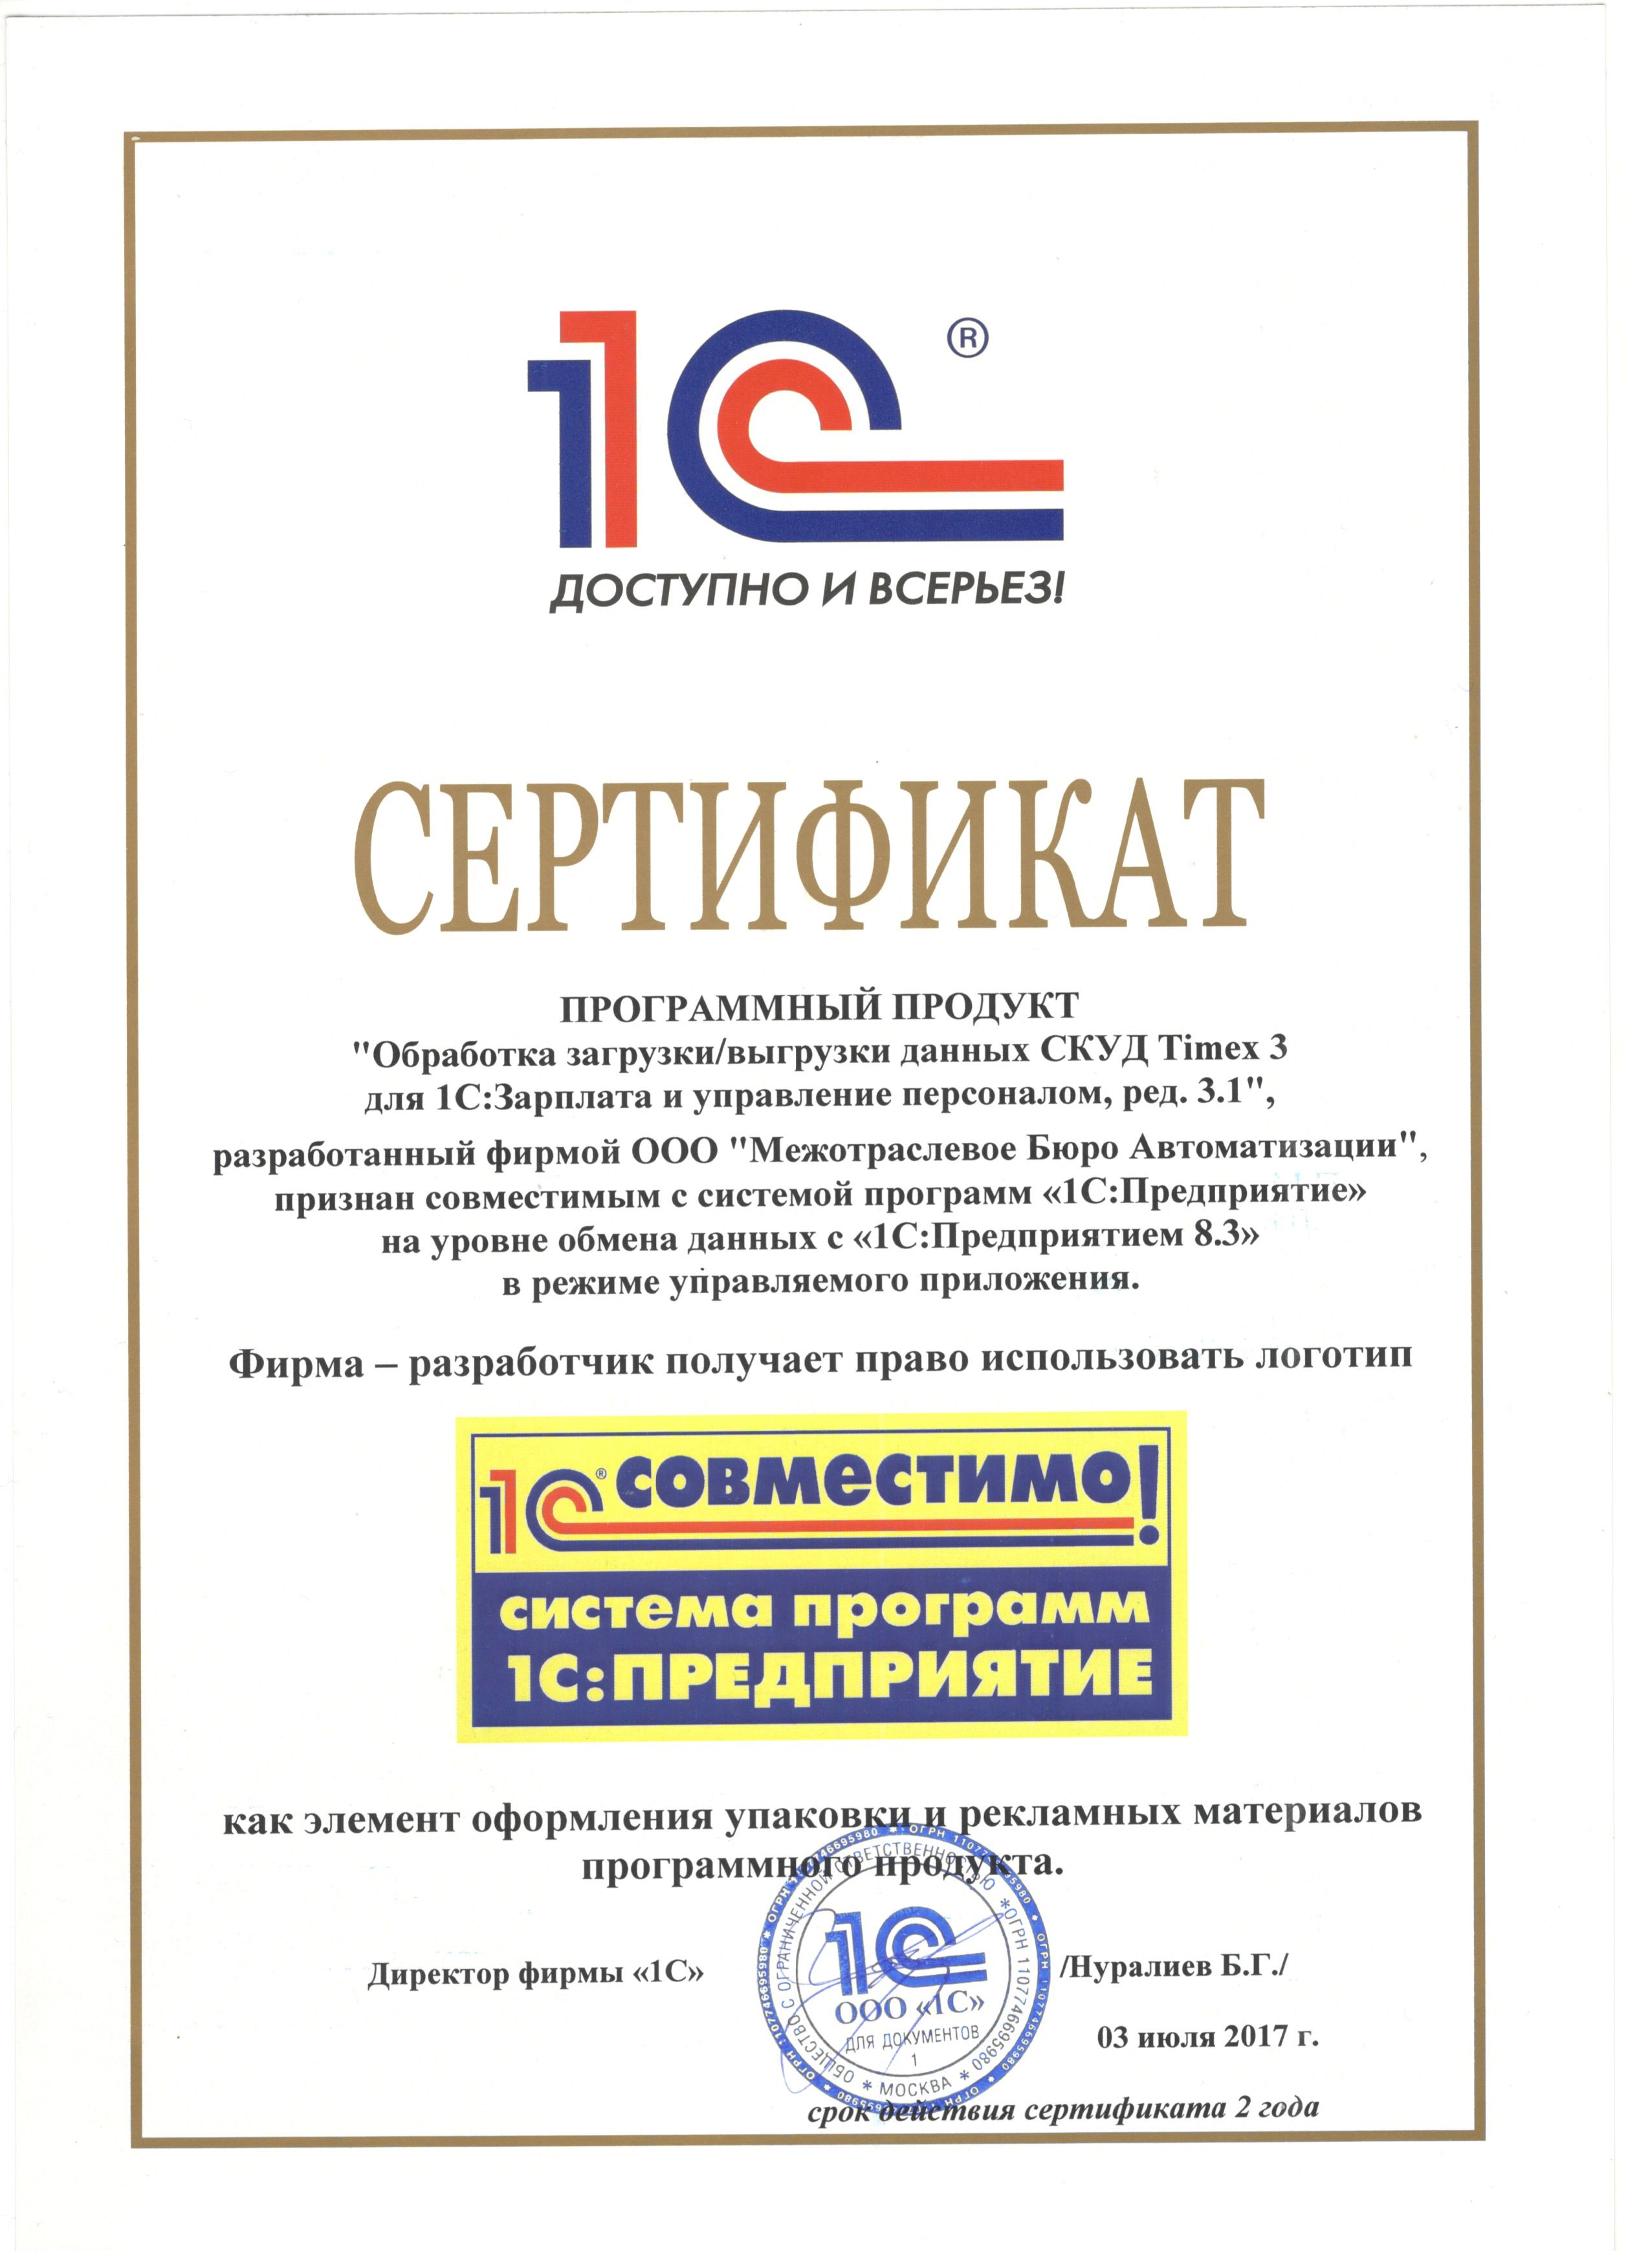 Обработка загрузки Timex - ЗУП 3.1